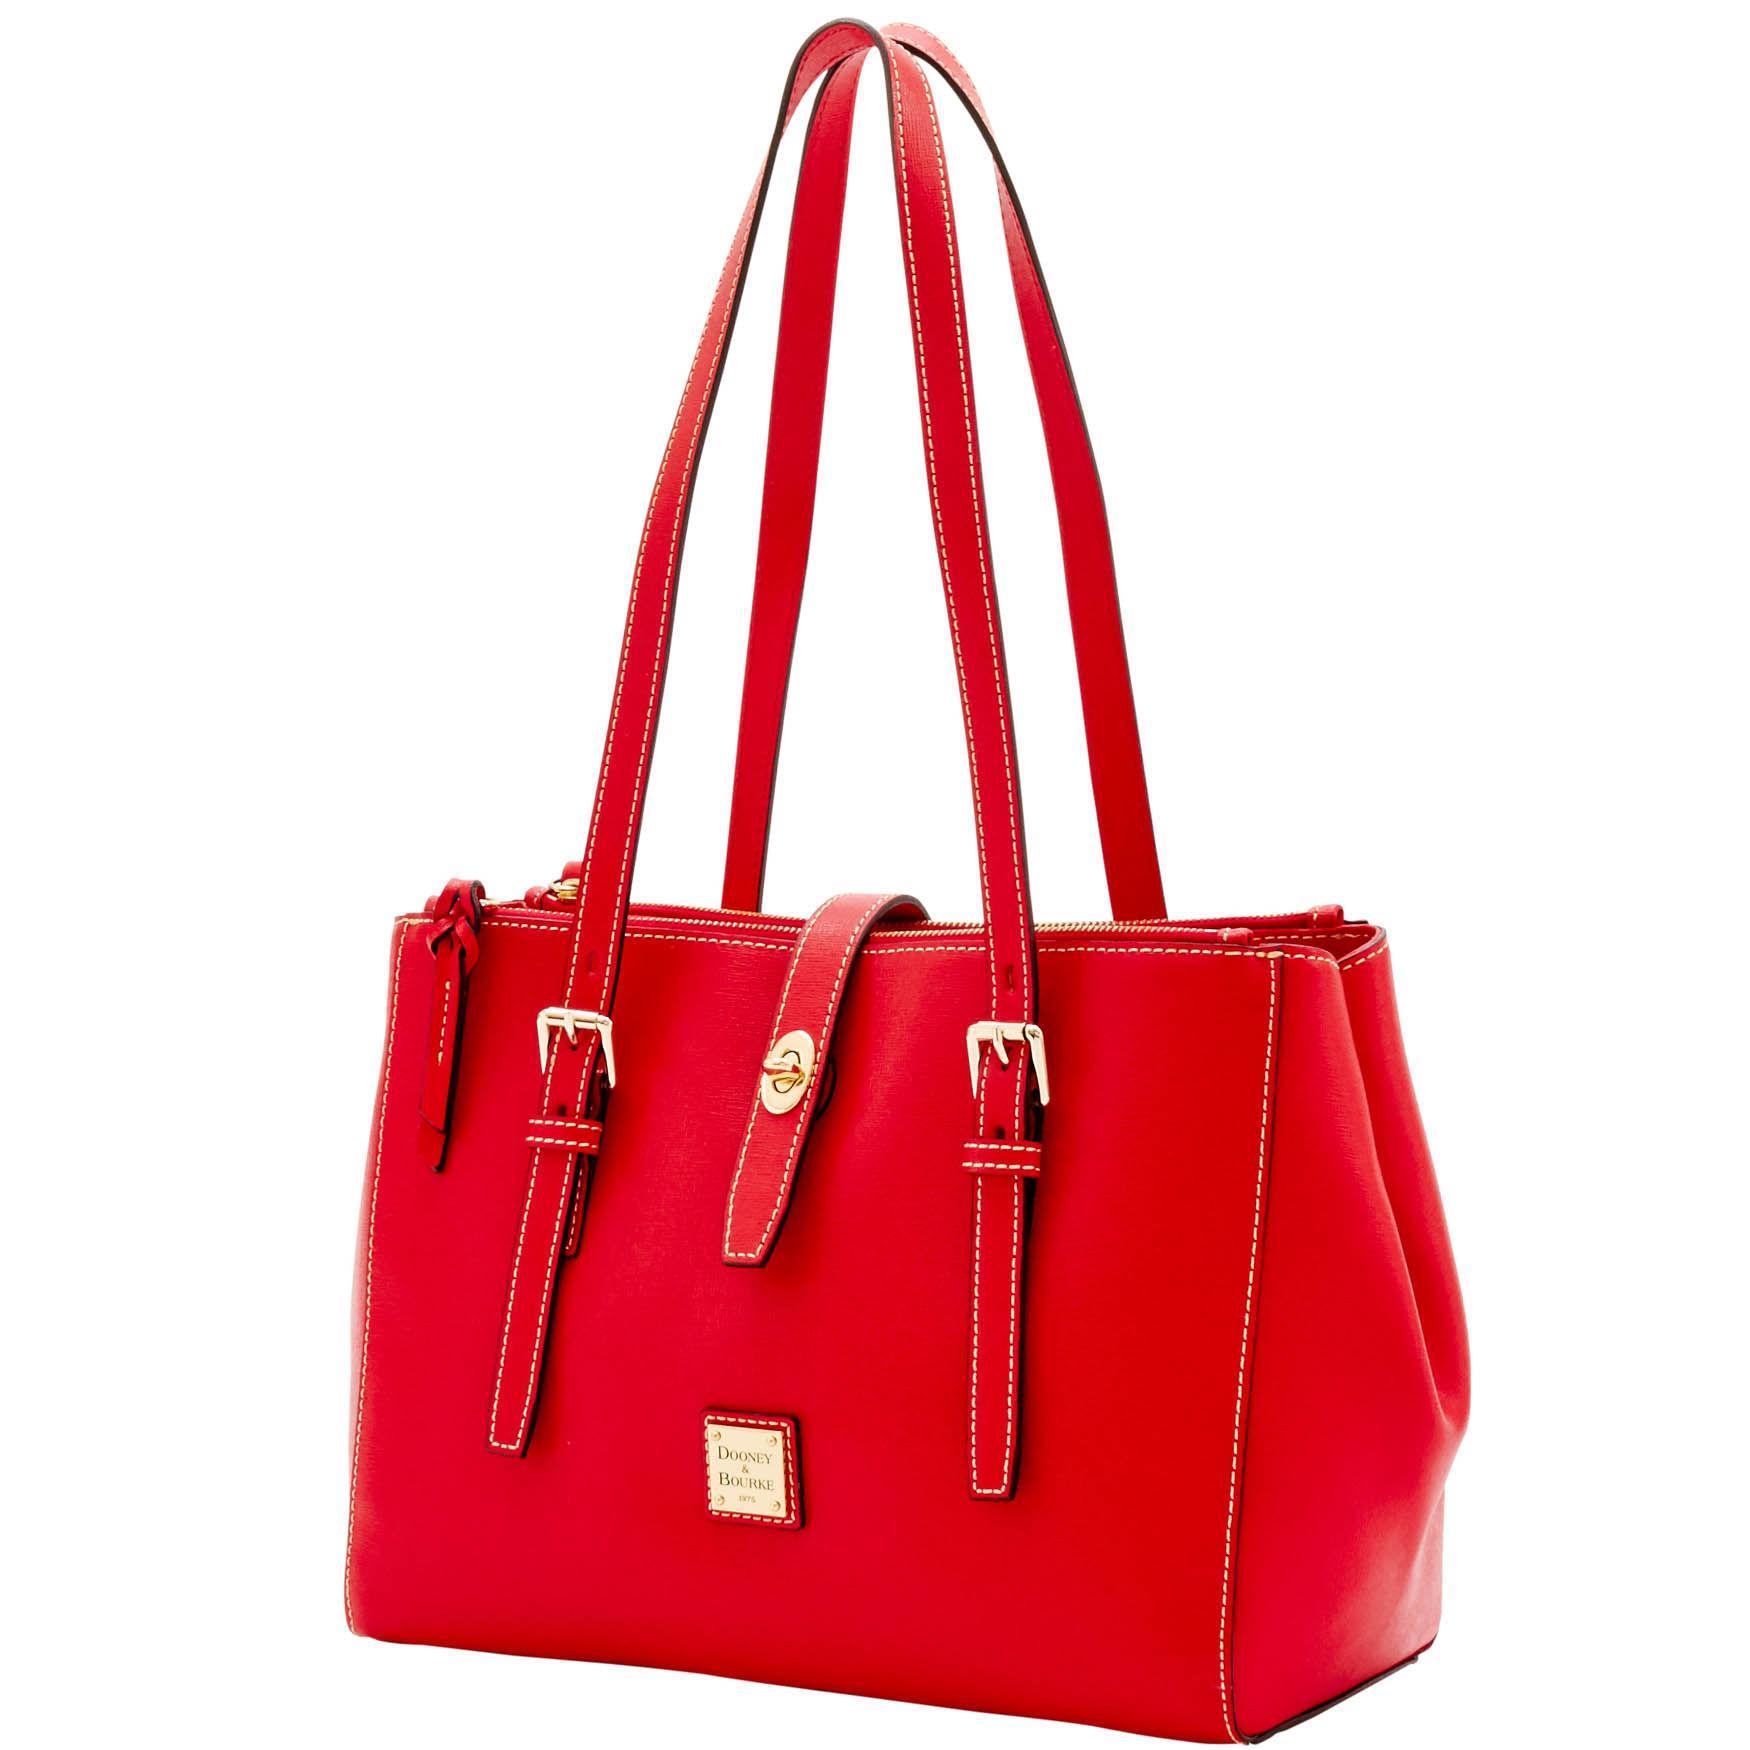 d629499a4639 Lyst - Dooney   Bourke Saffiano Miller Shopper in Red